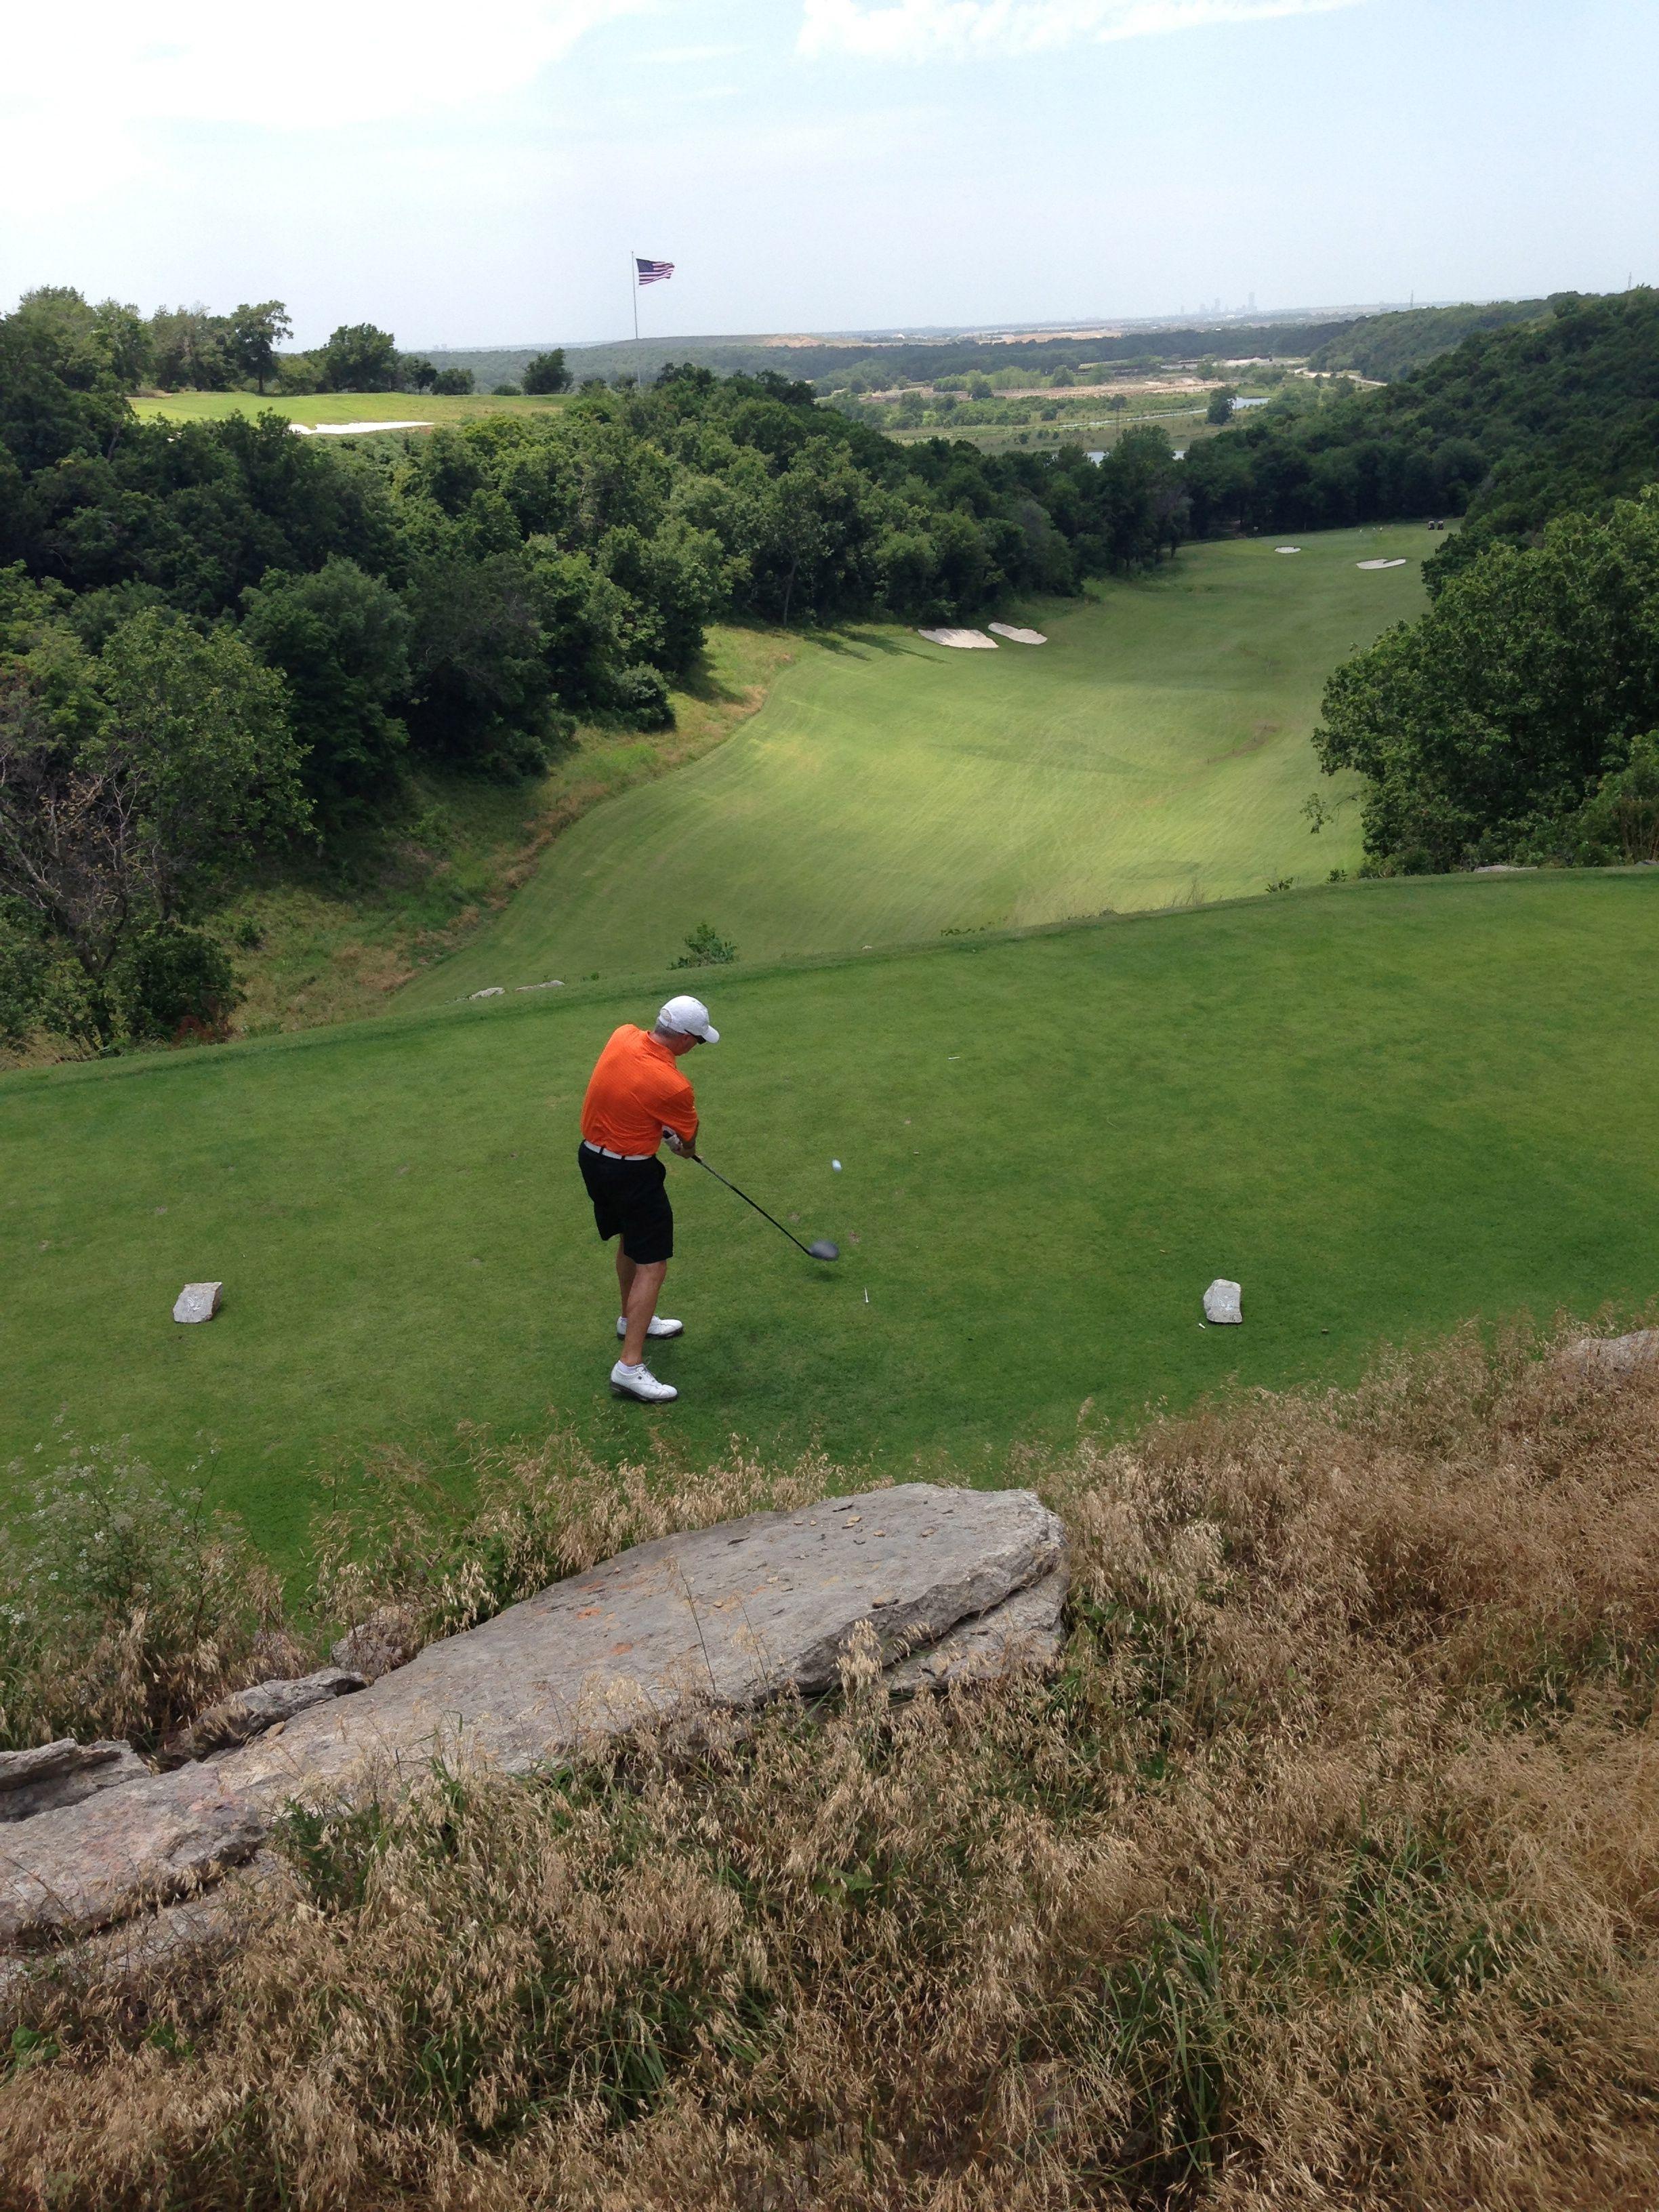 The Patriot Golf Club In Owasso Ok Home Of Folds Of Honor Foundation Thepatriot Owassooklahoma Golf Oklahomago Folds Of Honor Golf Courses Play Golf